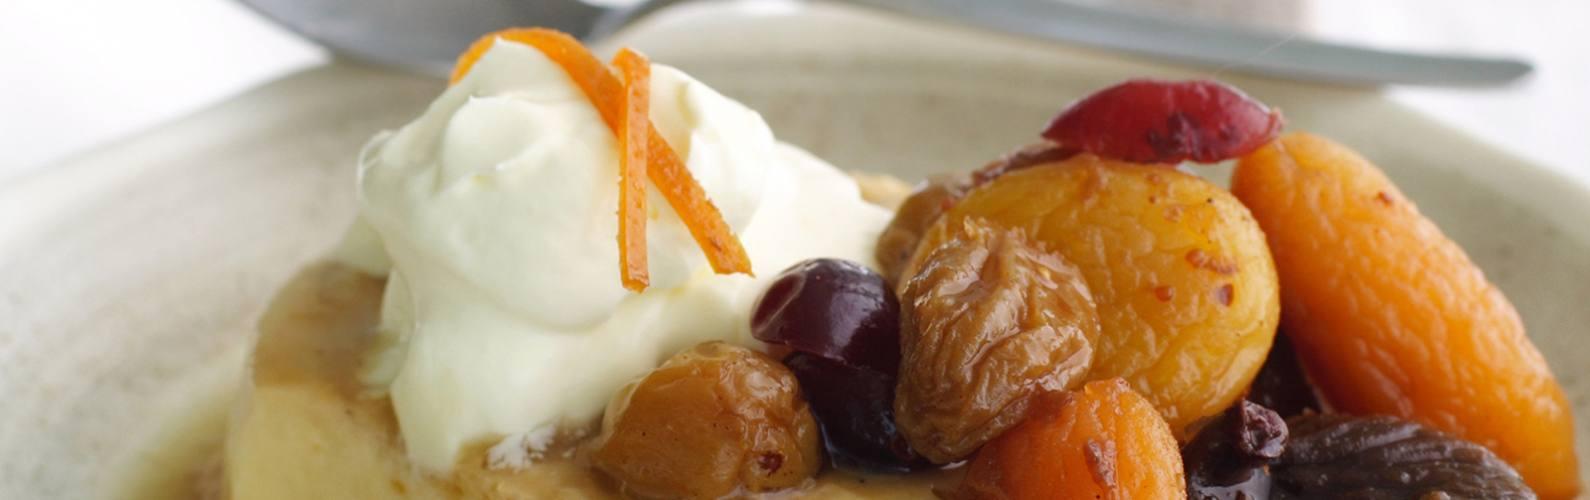 Decadent recipes for dried fruit